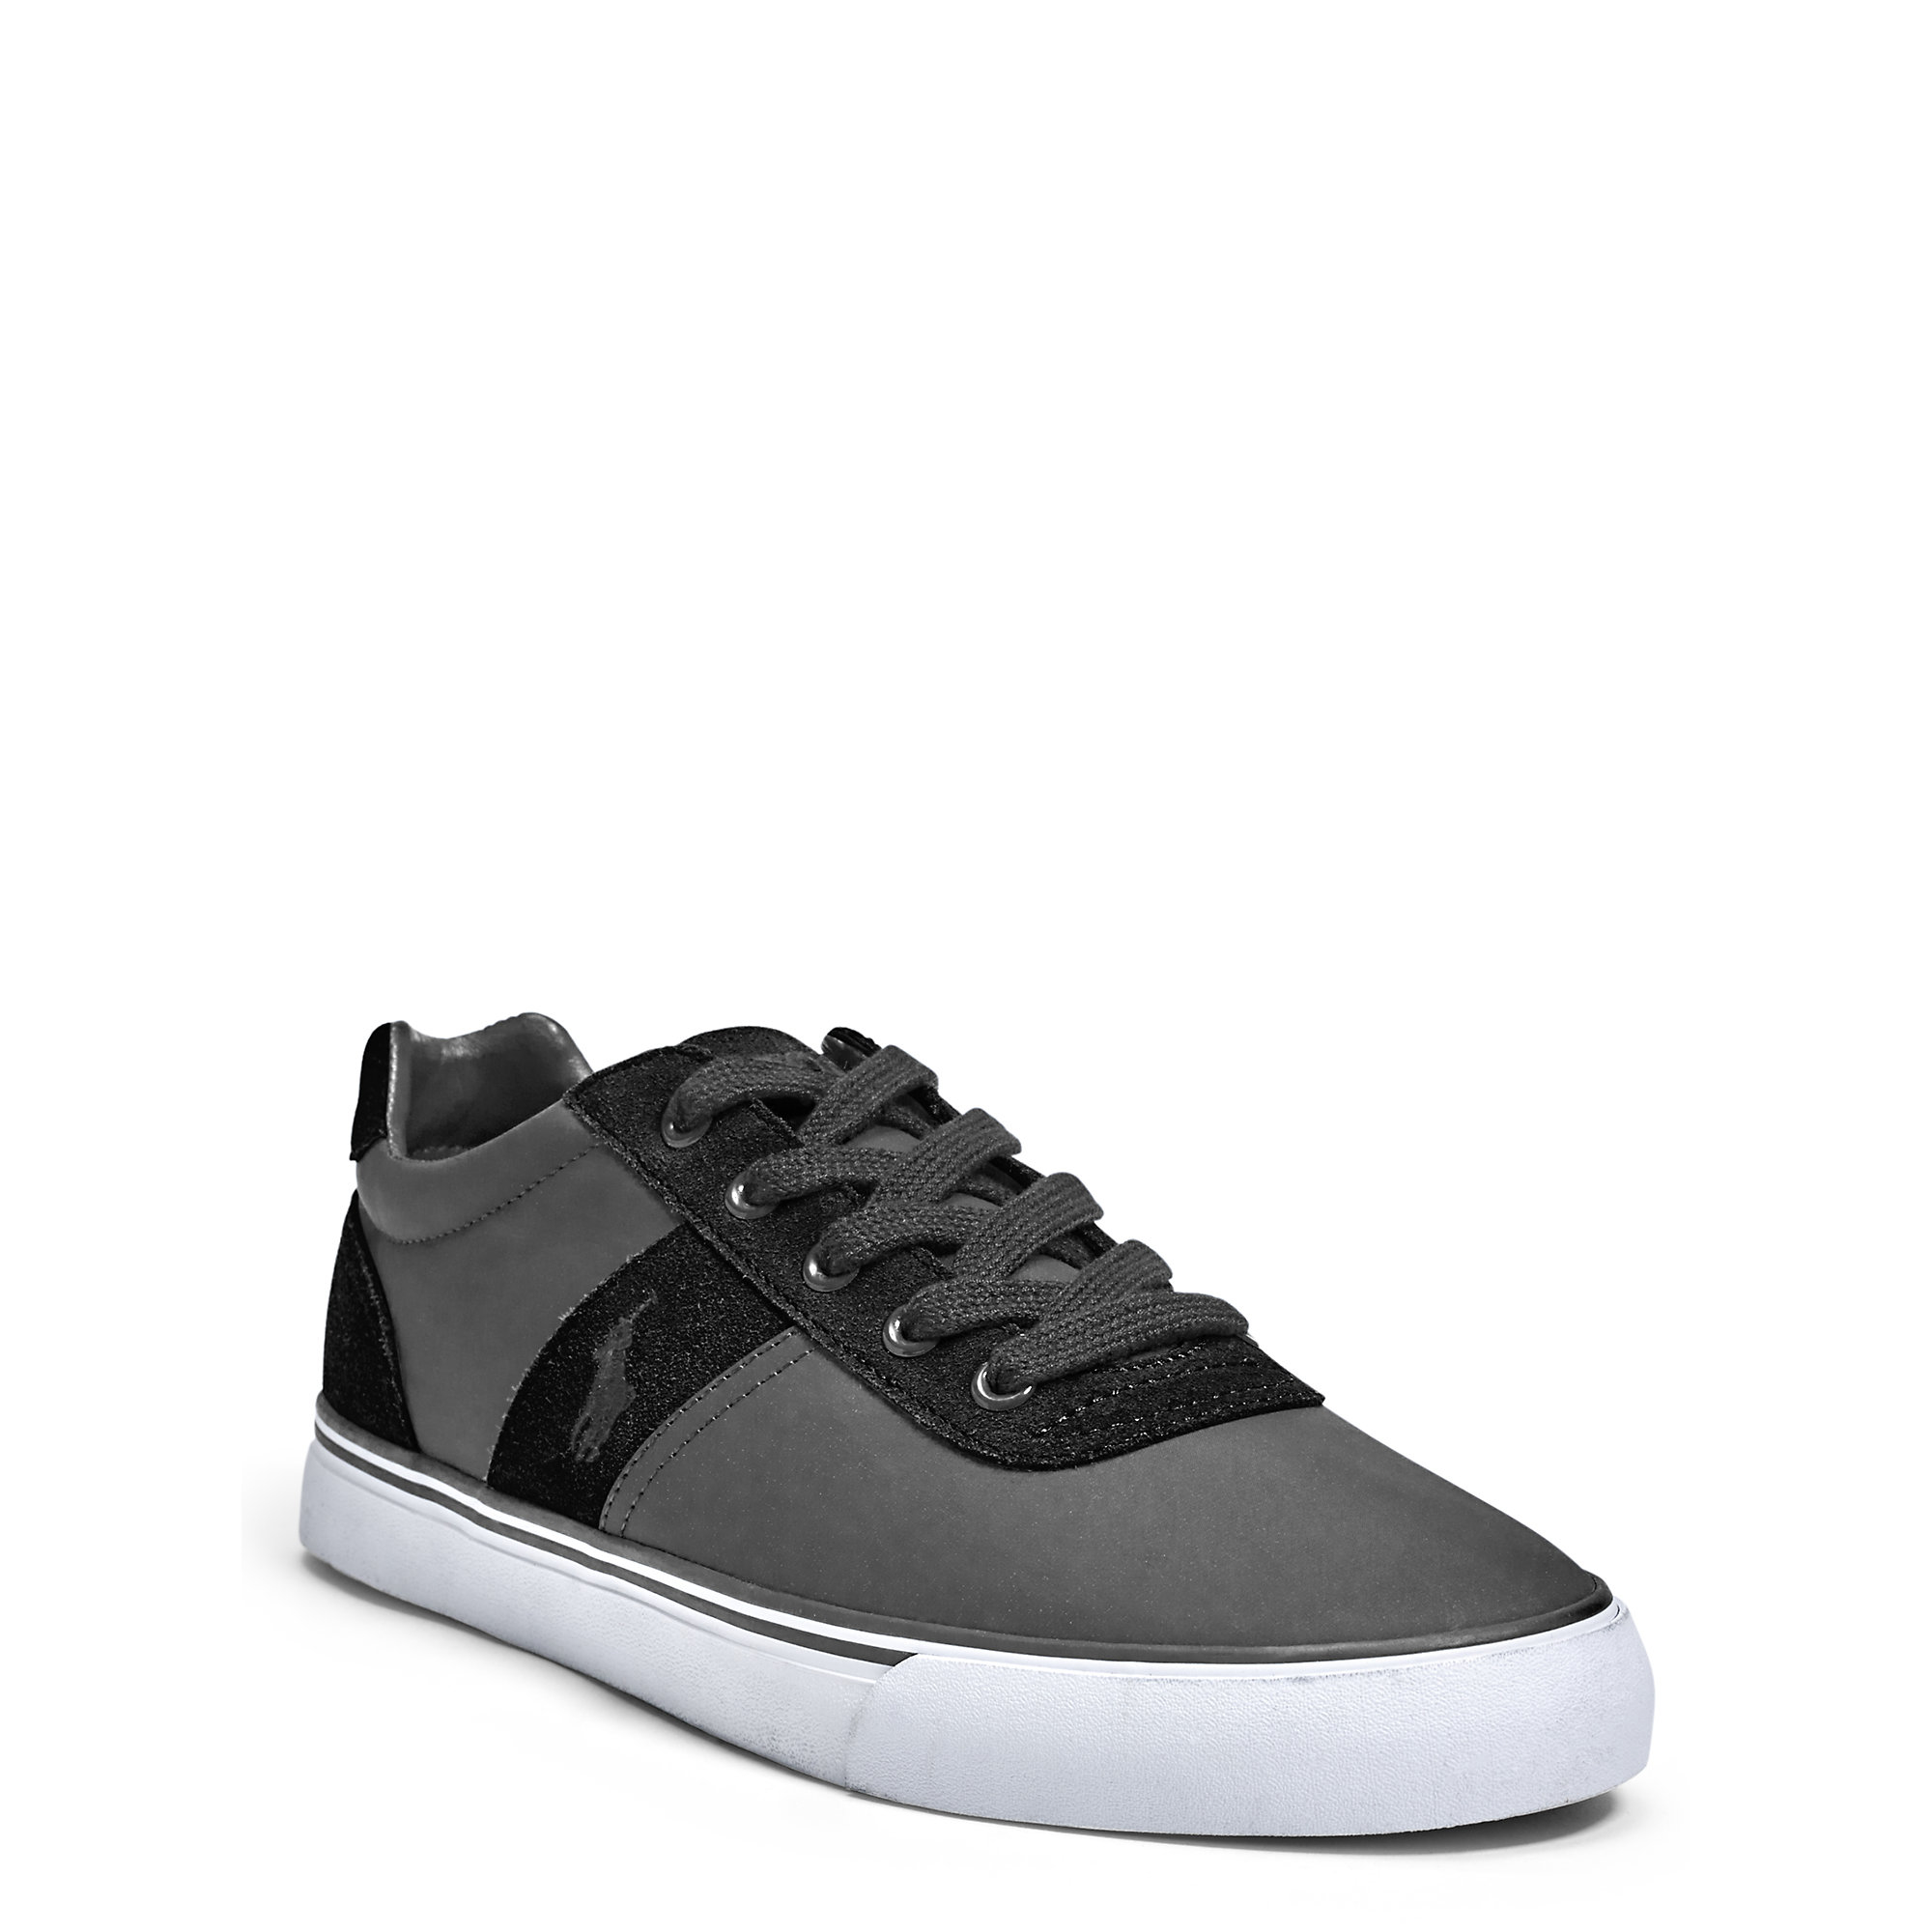 polo ralph lauren hanford suede nylon sneaker in black for men lyst. Black Bedroom Furniture Sets. Home Design Ideas